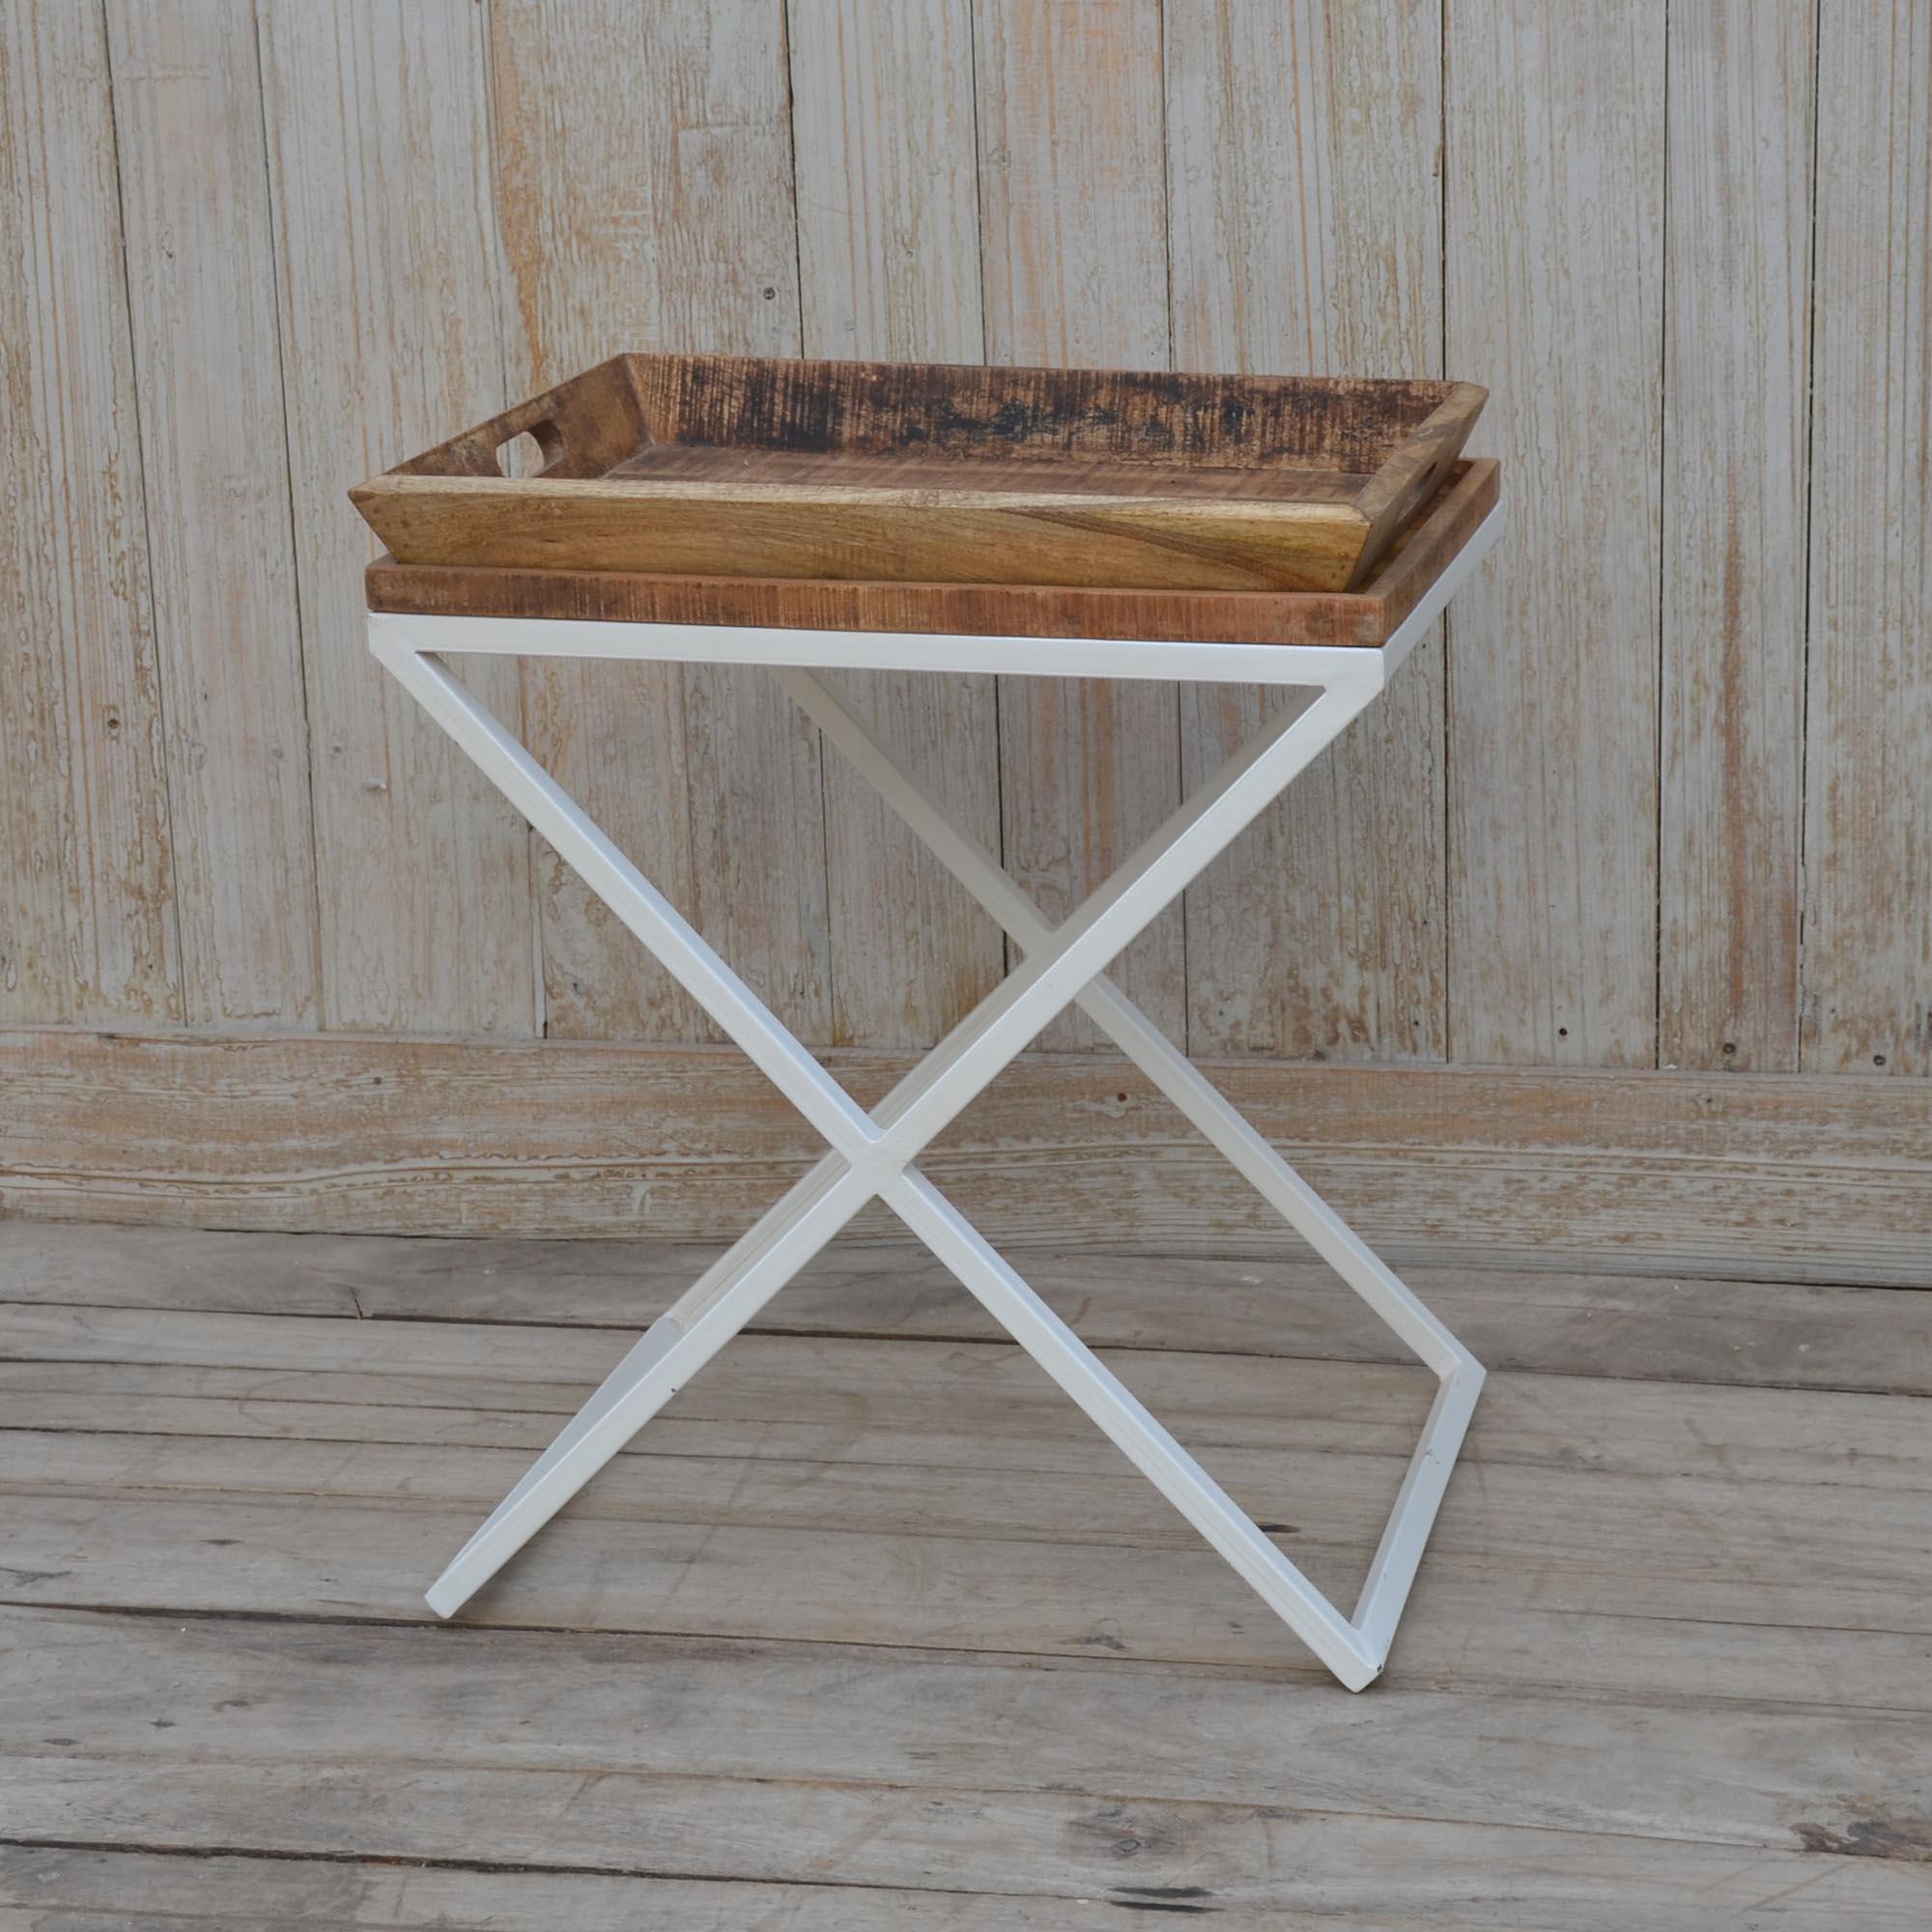 Cross Legged Wooden Tray Table